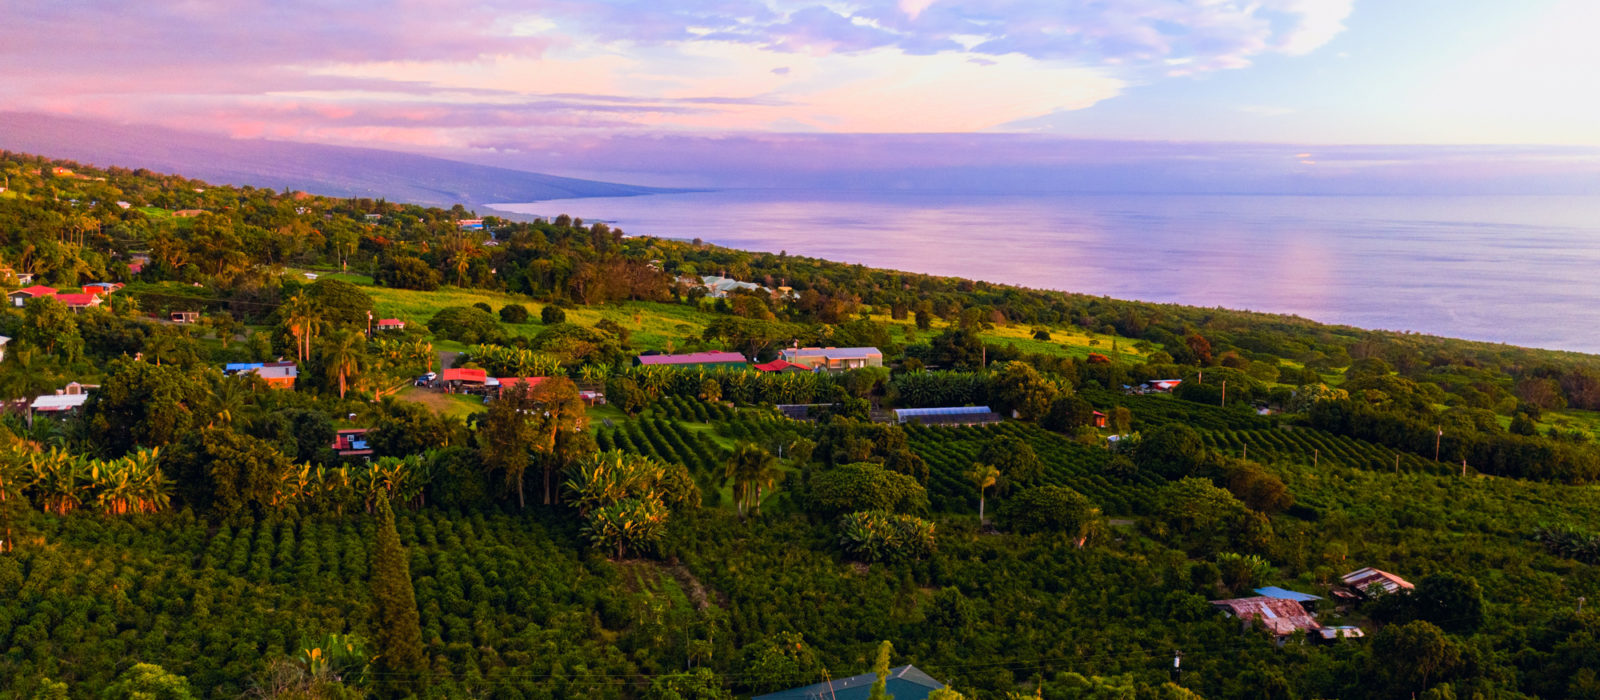 Greenwell Farms, Kona, Hawaii